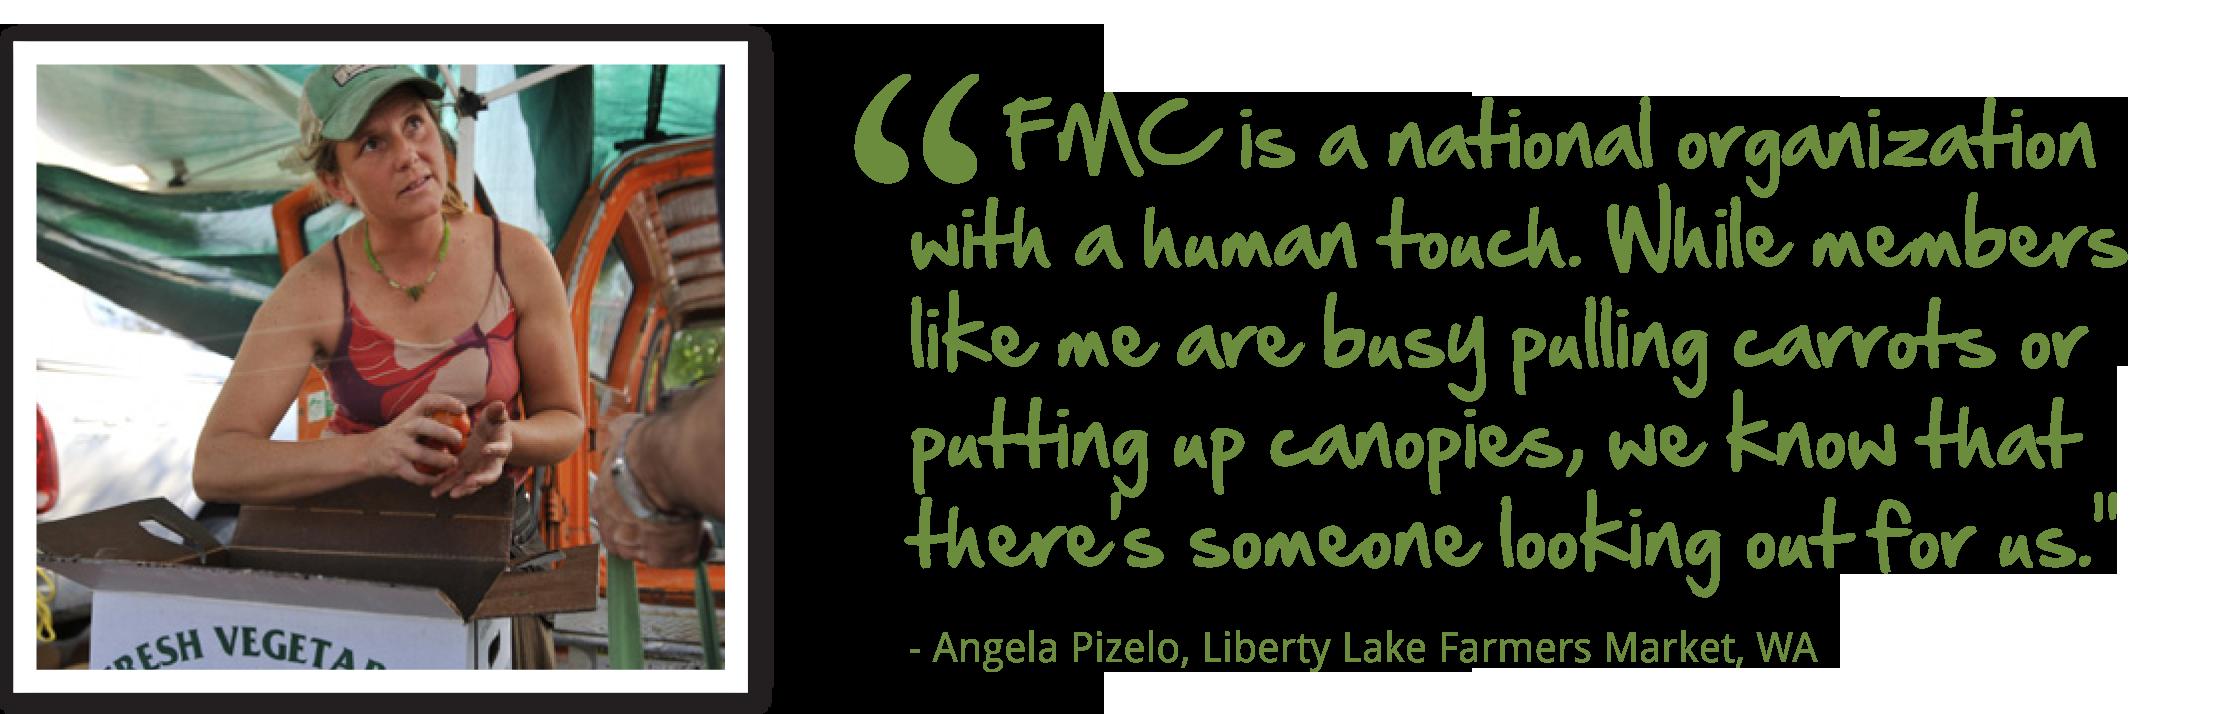 FMC_Sponsorship_2013_quote